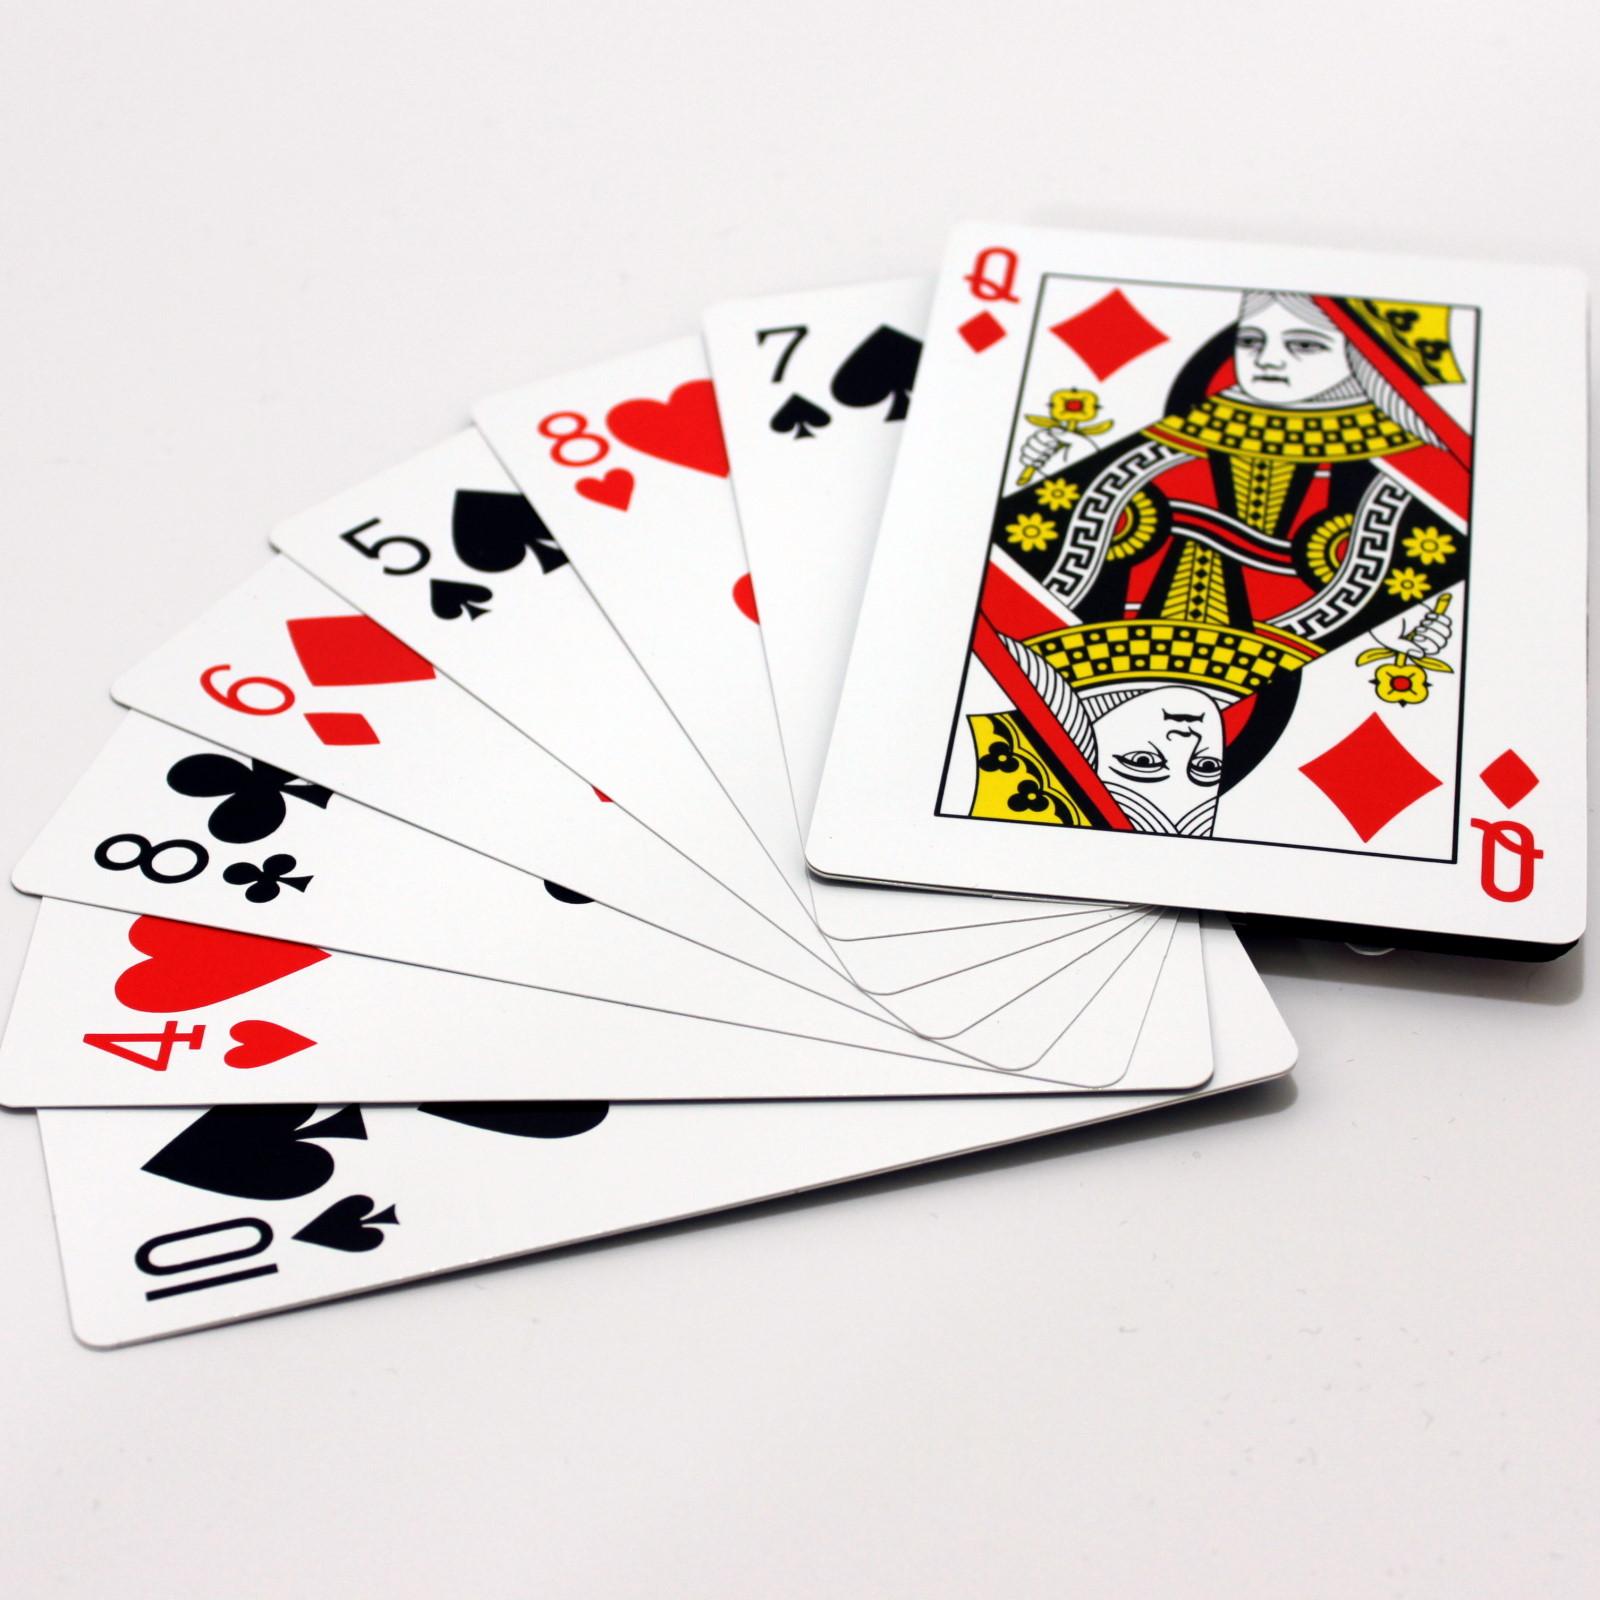 Jumbo Fan To Minature Card Castle by Ton Onosaka